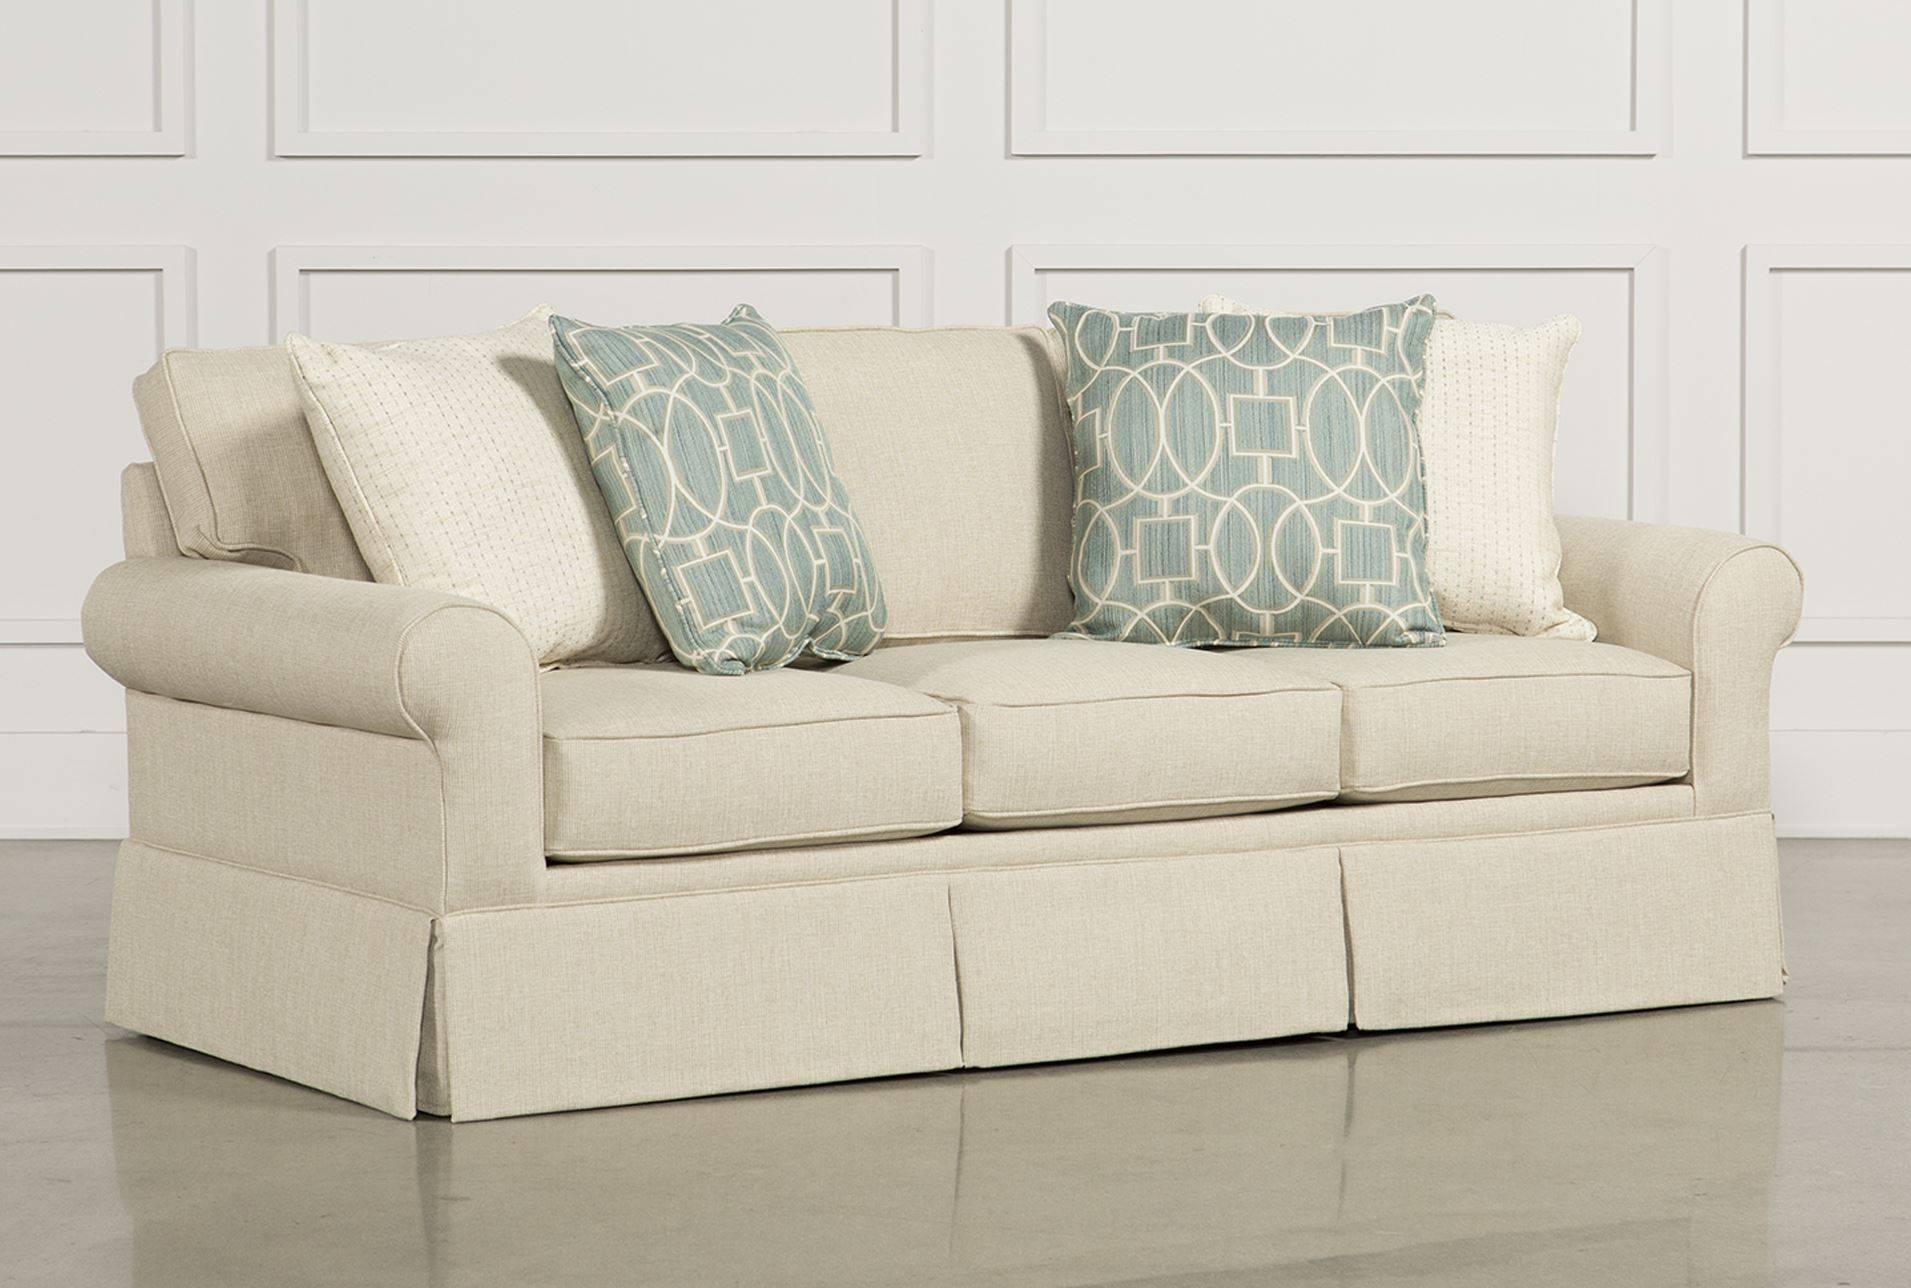 Fresh White Fabric Sofa 31 On Modern Sofa Ideas With White Fabric Sofa regarding White Fabric Sofas (Image 16 of 30)